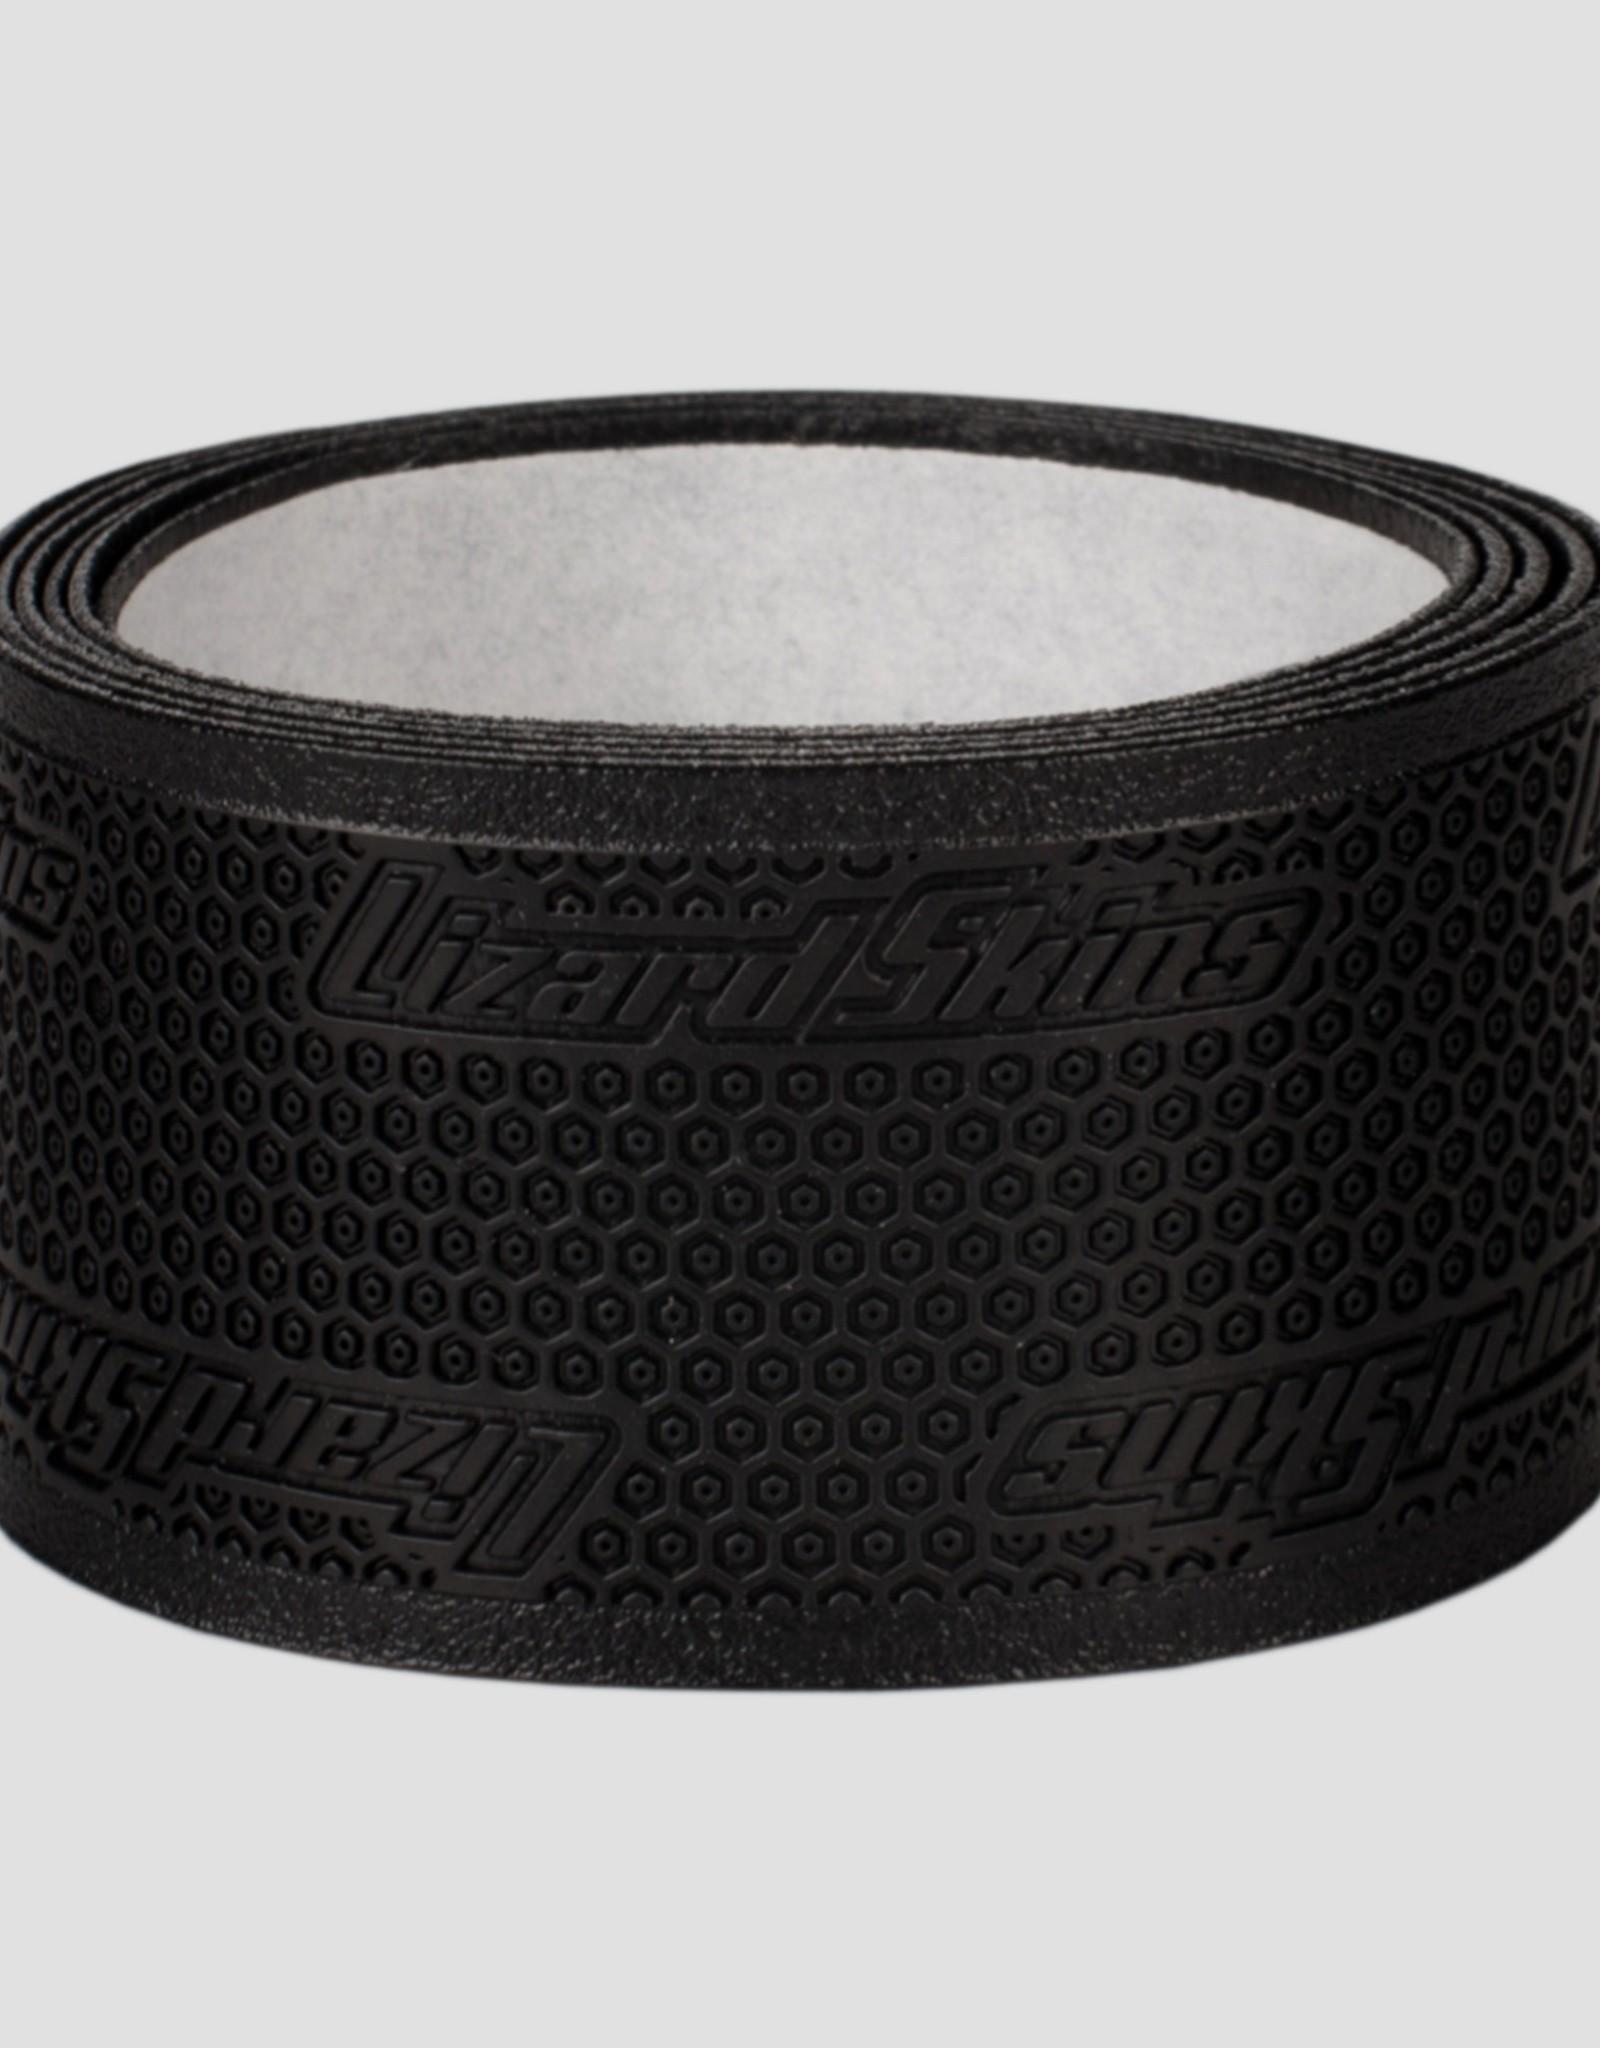 Lizard Skins Lizard Skins Hockey Grip Tape